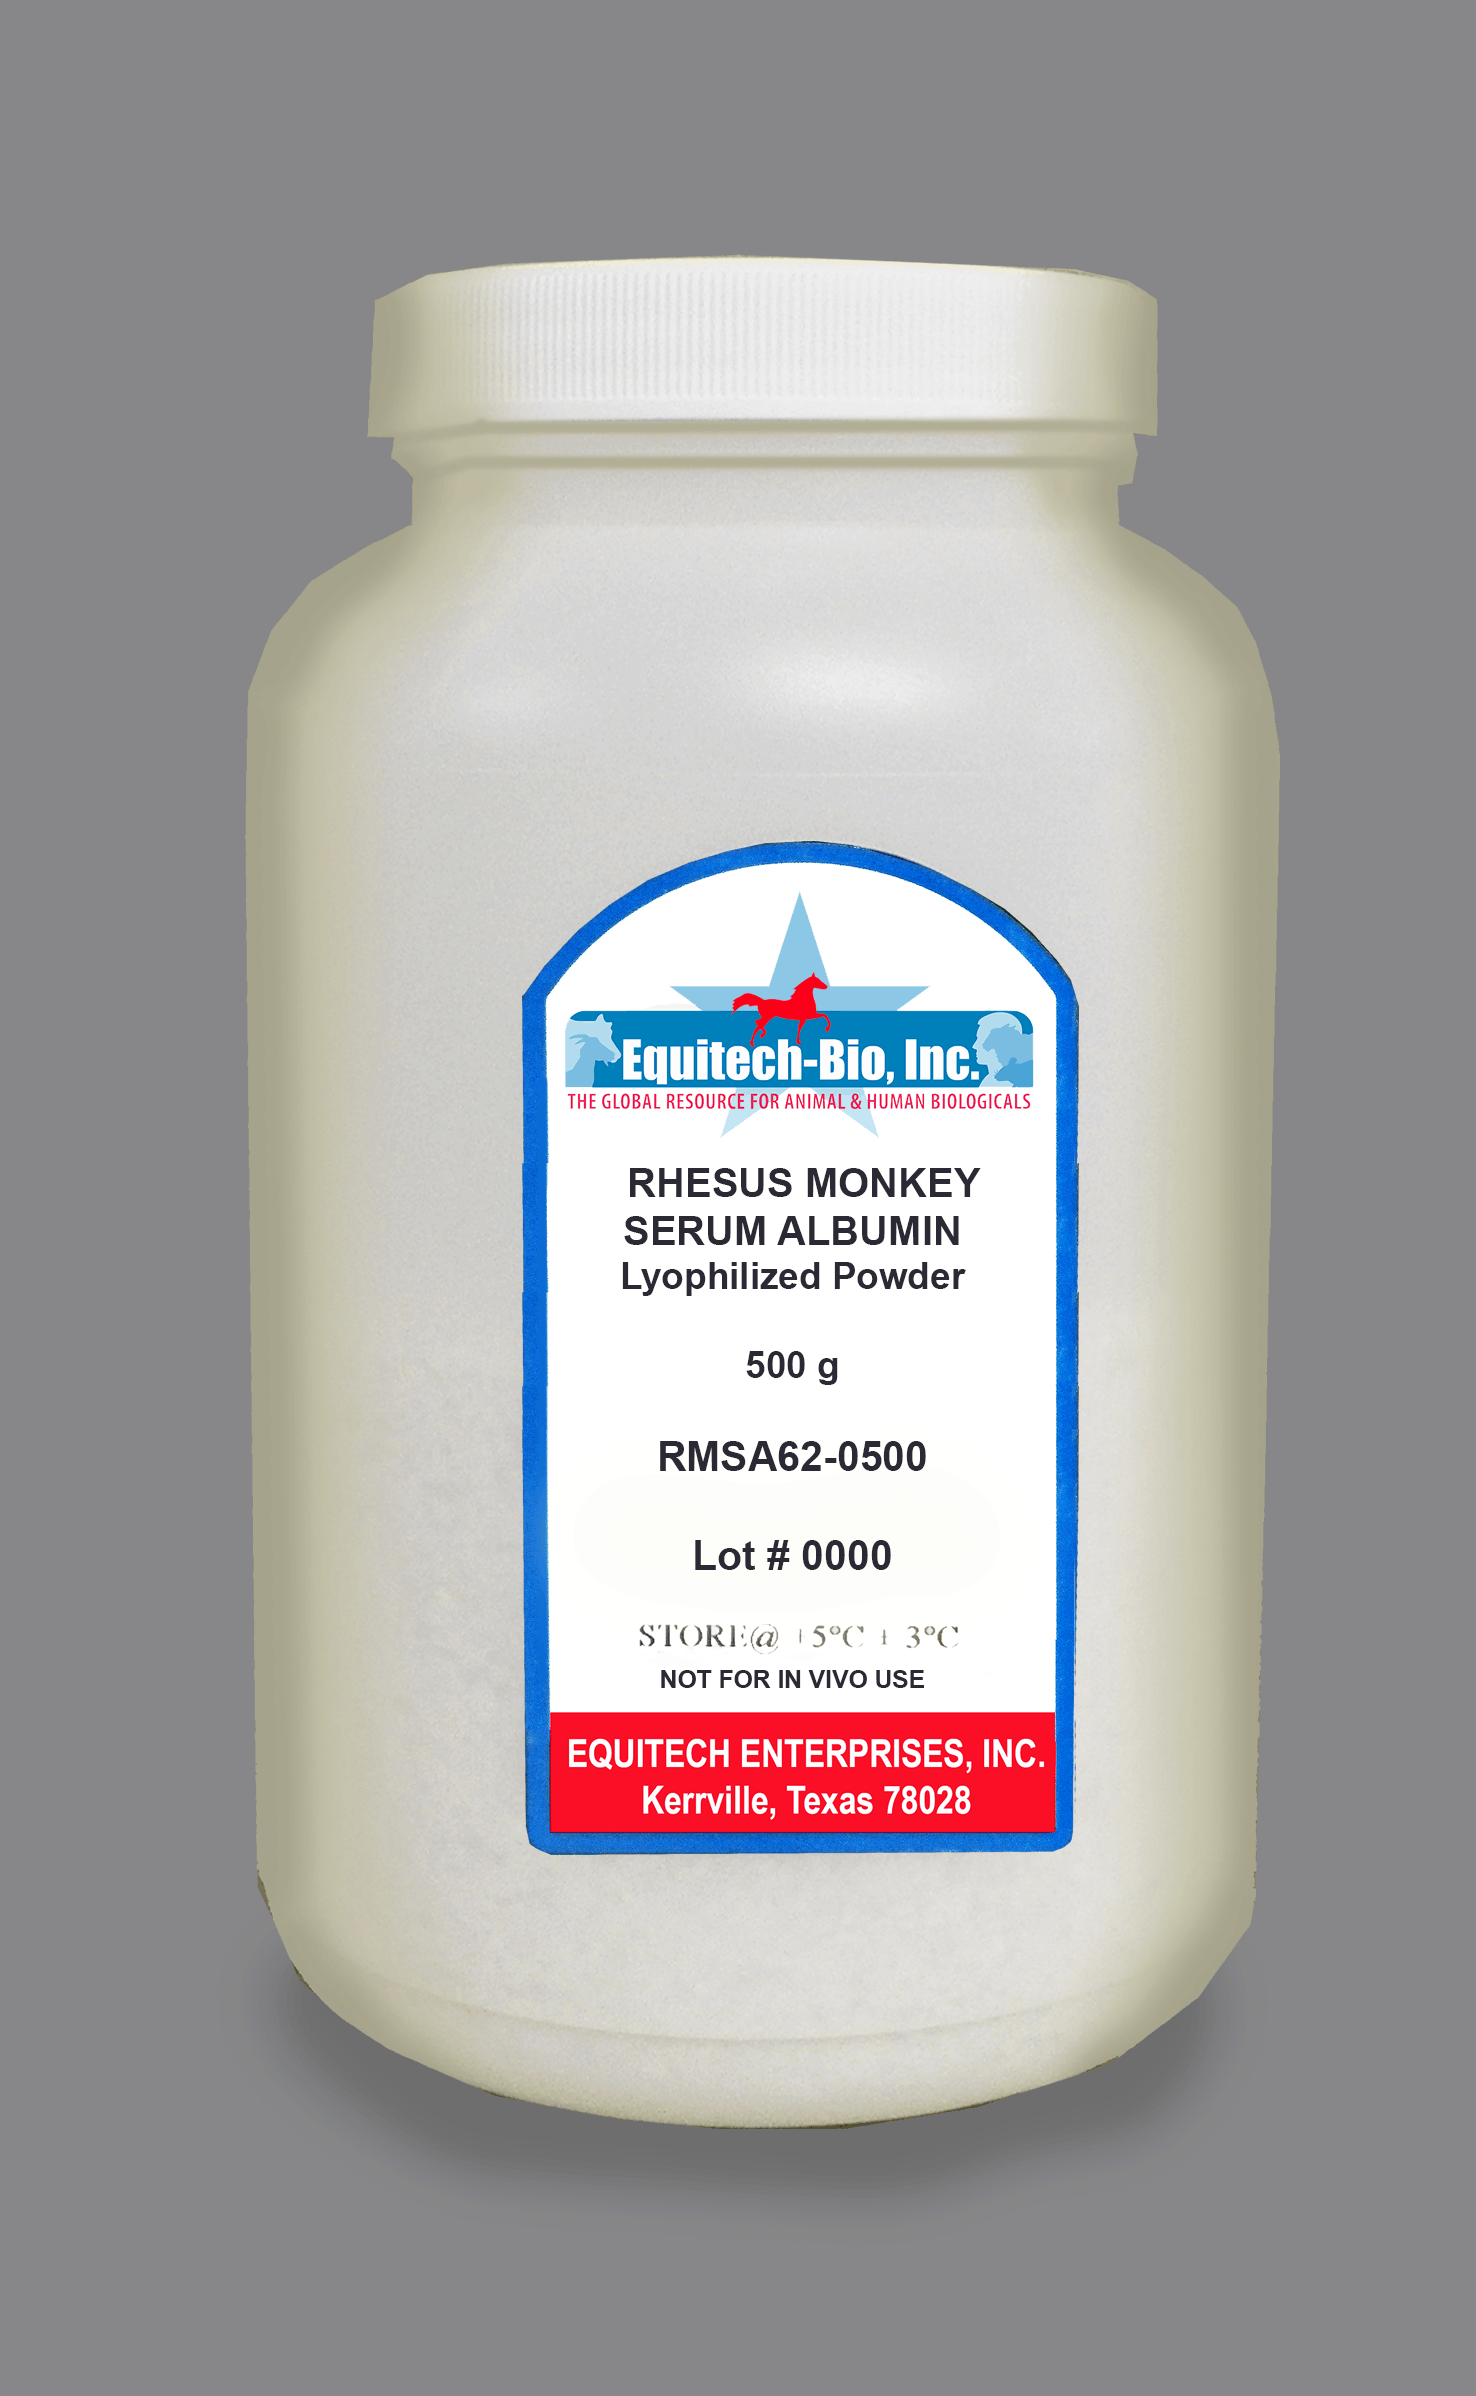 RMSA62 -- Rhesus Monkey Serum Albumin Lyophilized Powder